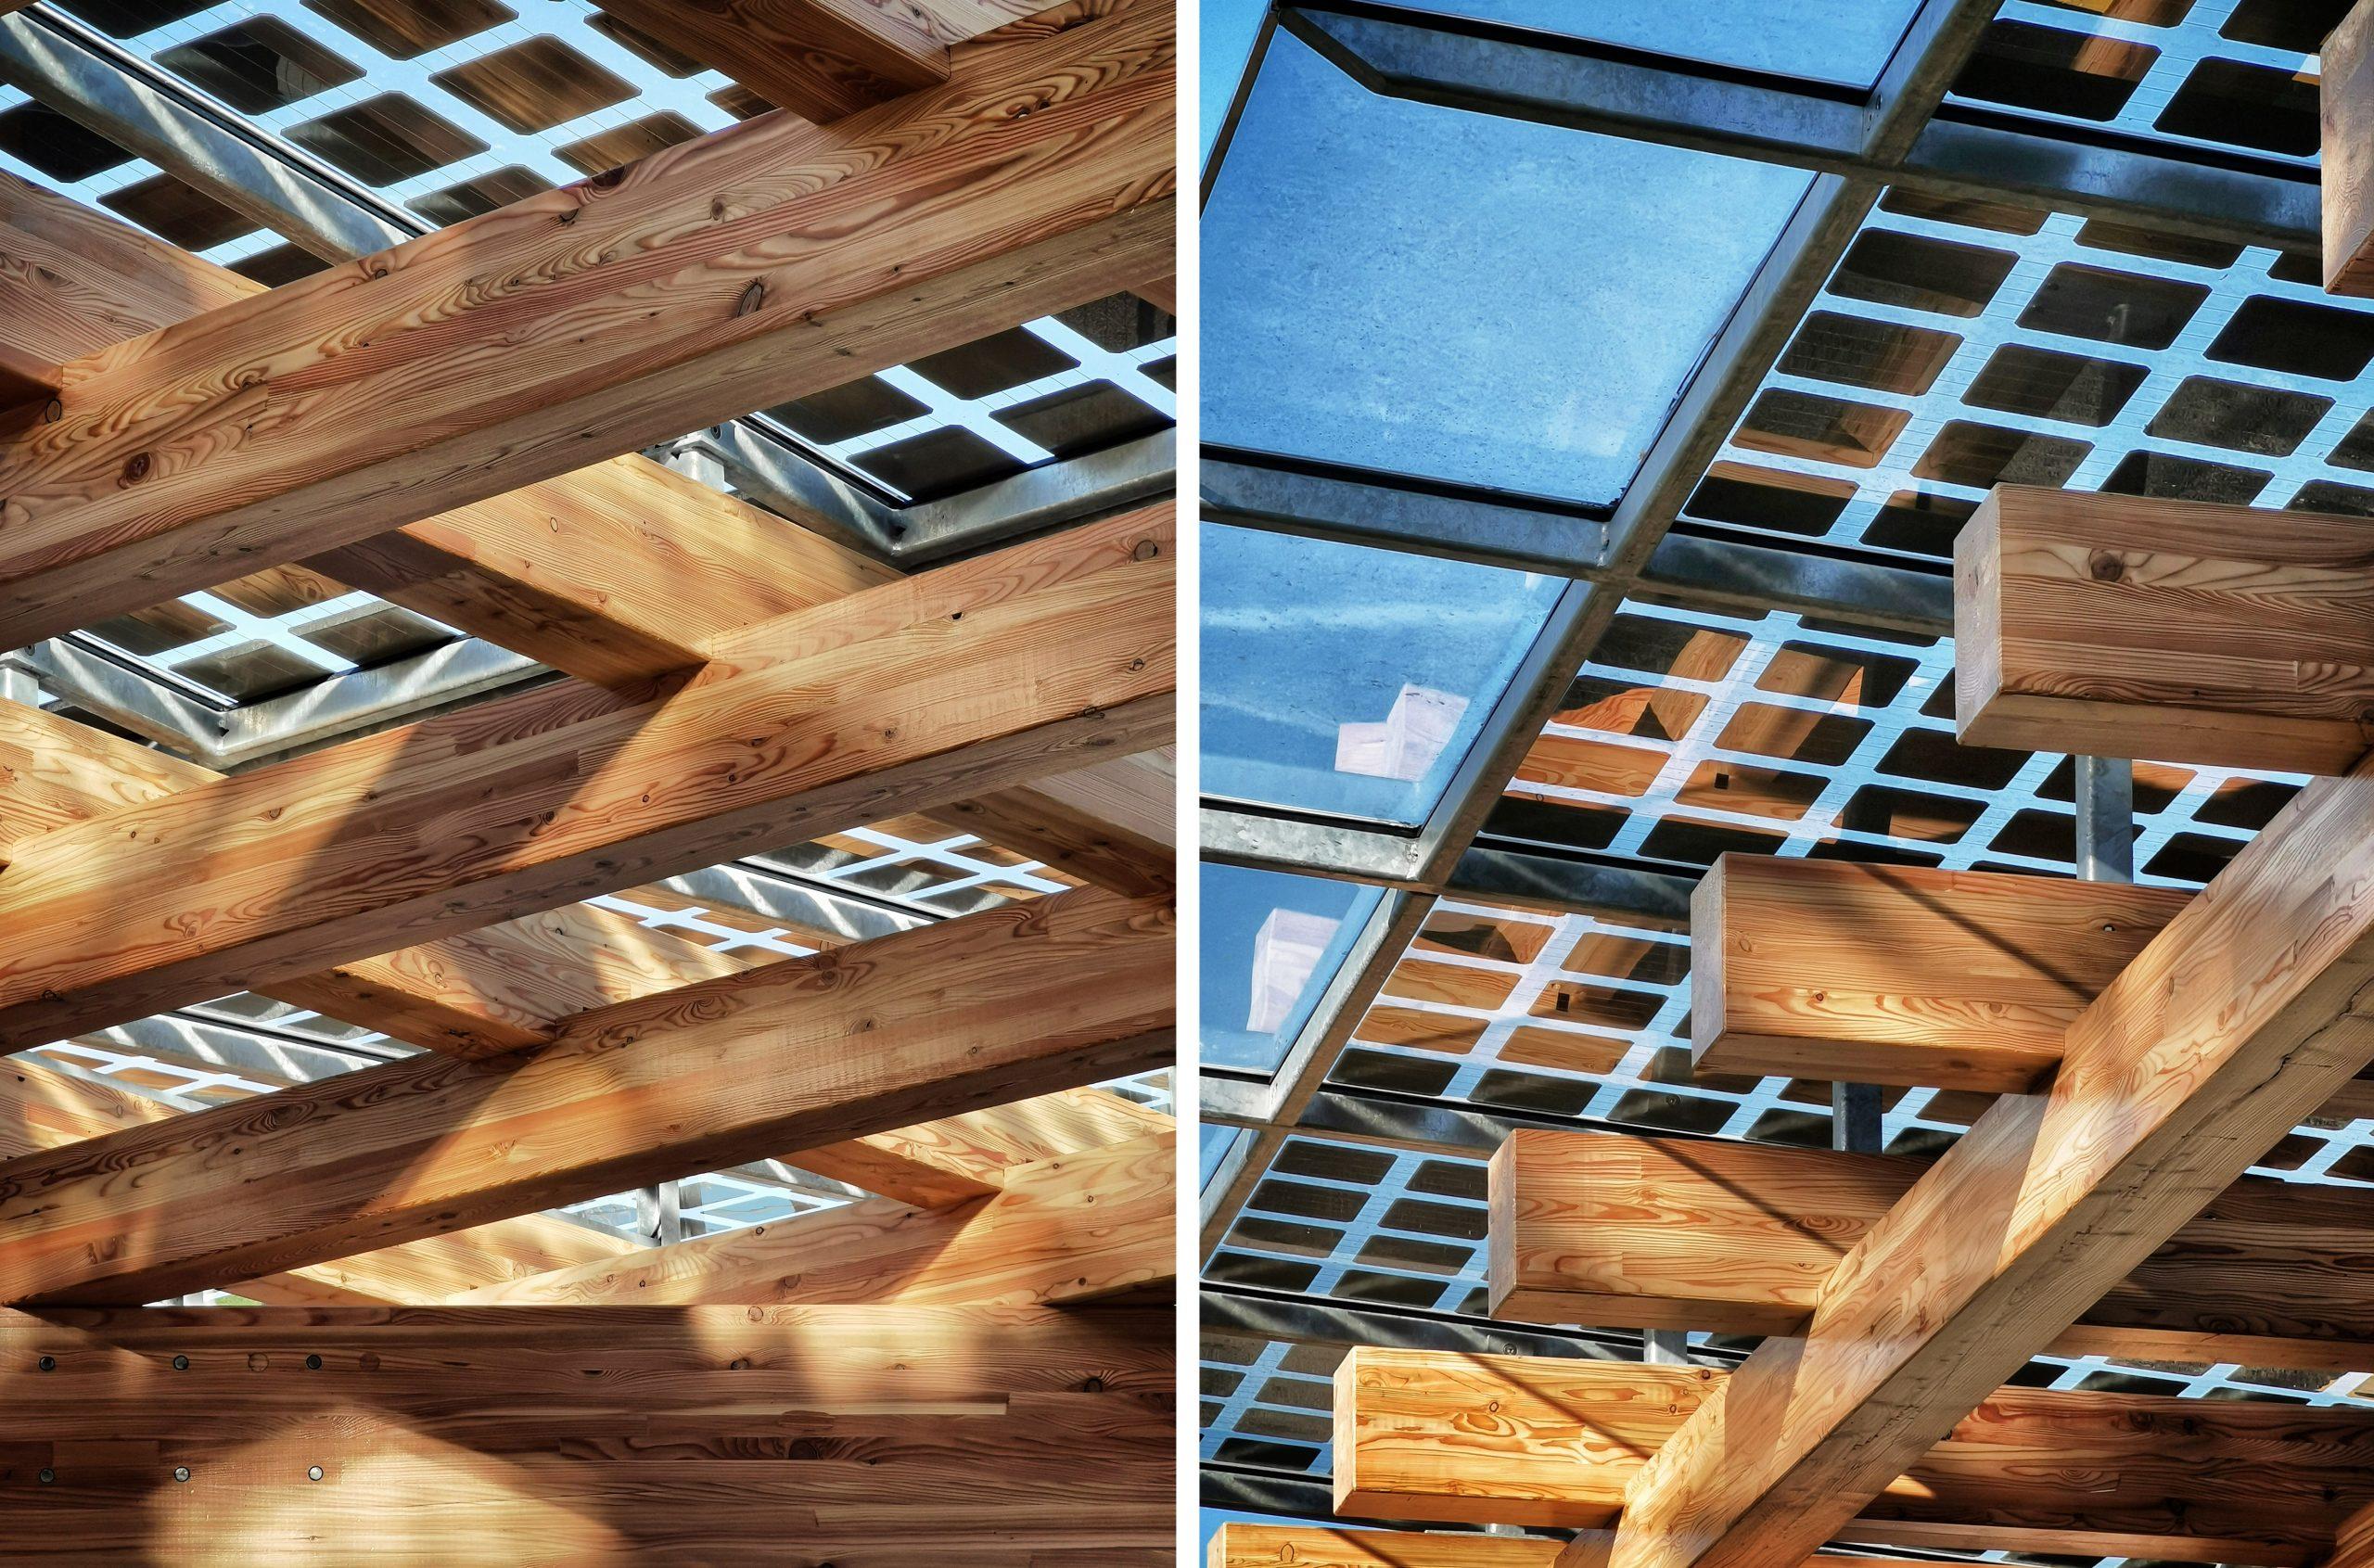 Sunfixings PV Solar Panels BIPV Glulam Hess Timber Frame